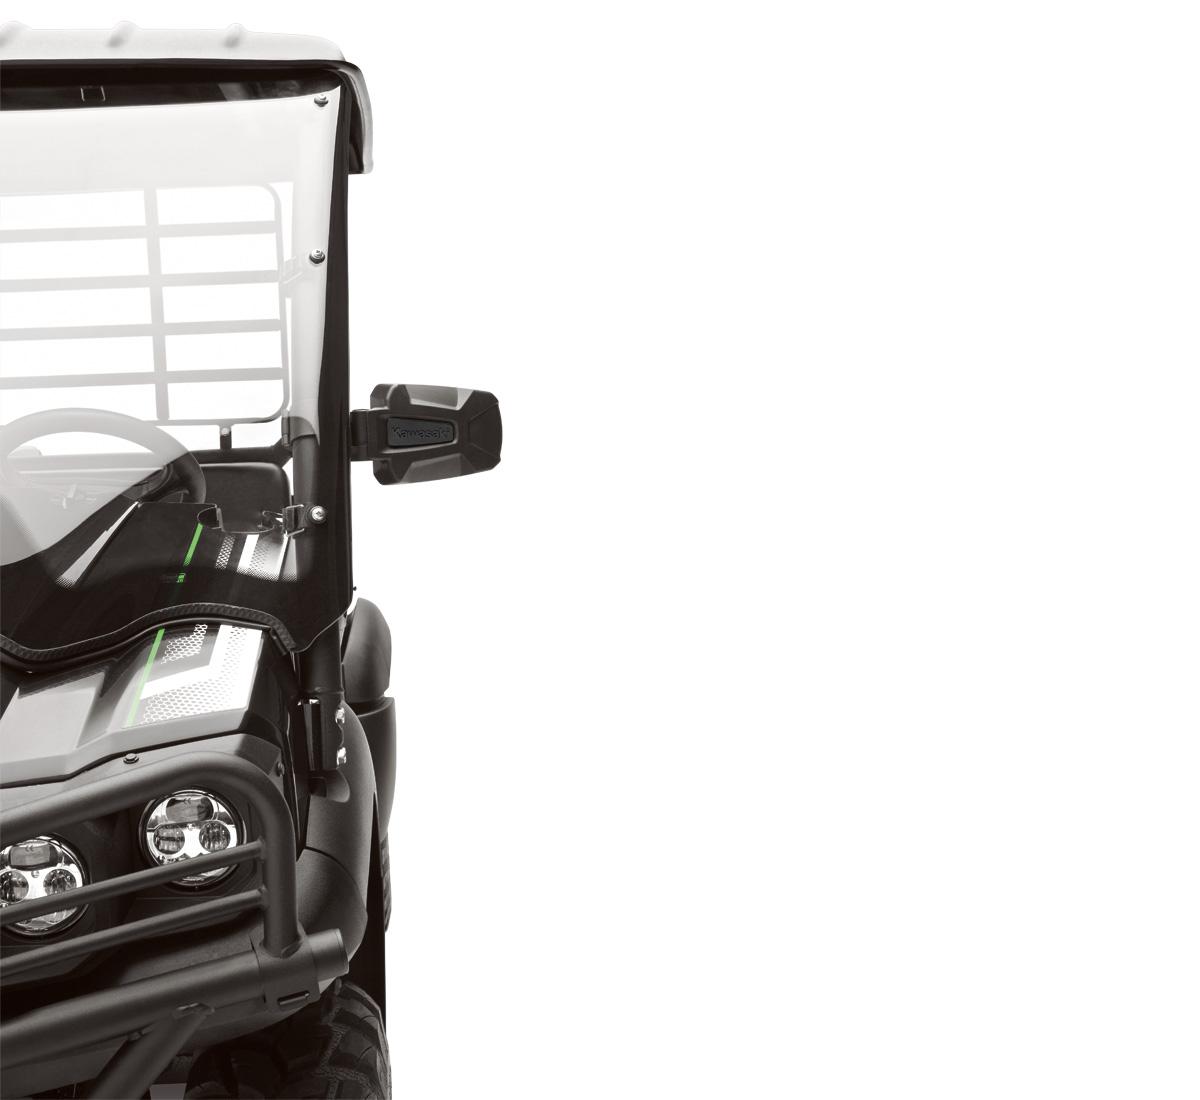 2018 Mule Pro Fxr Accessories Kawasaki 4010 Electrical Wiring Harness Side Mirror Set Premium